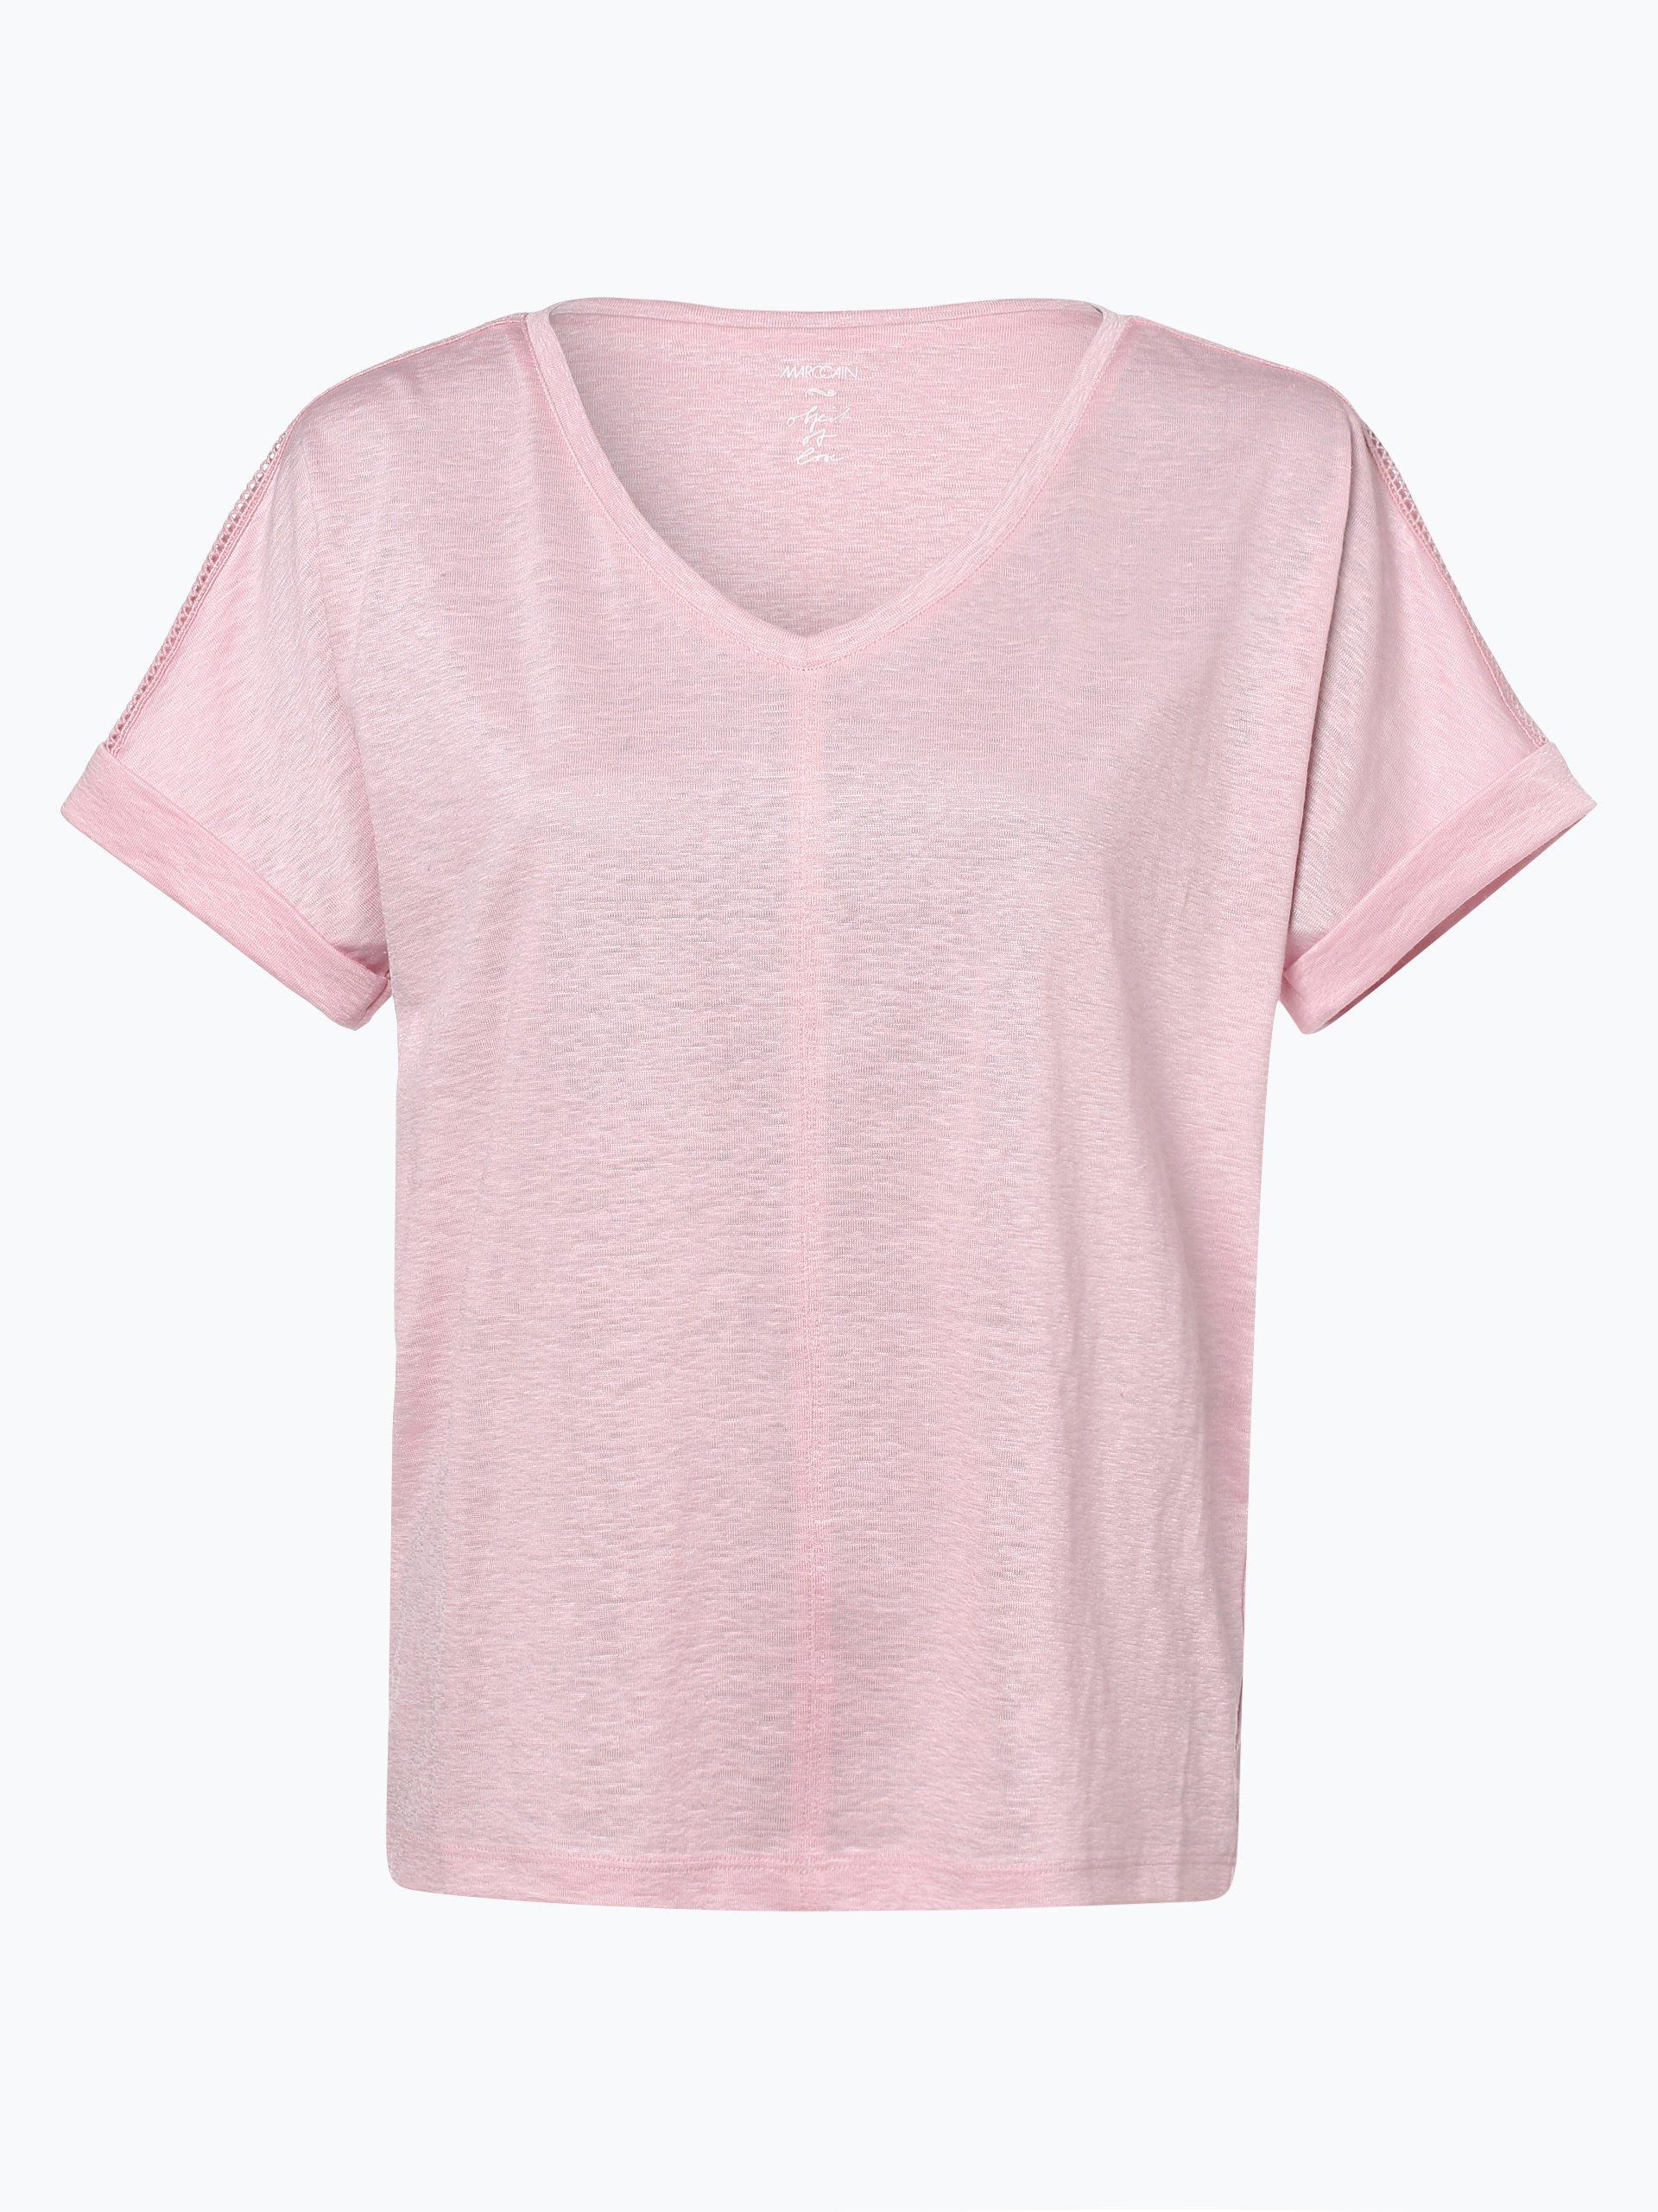 Marc Cain Collections T-shirt damski z dodatkiem lnu